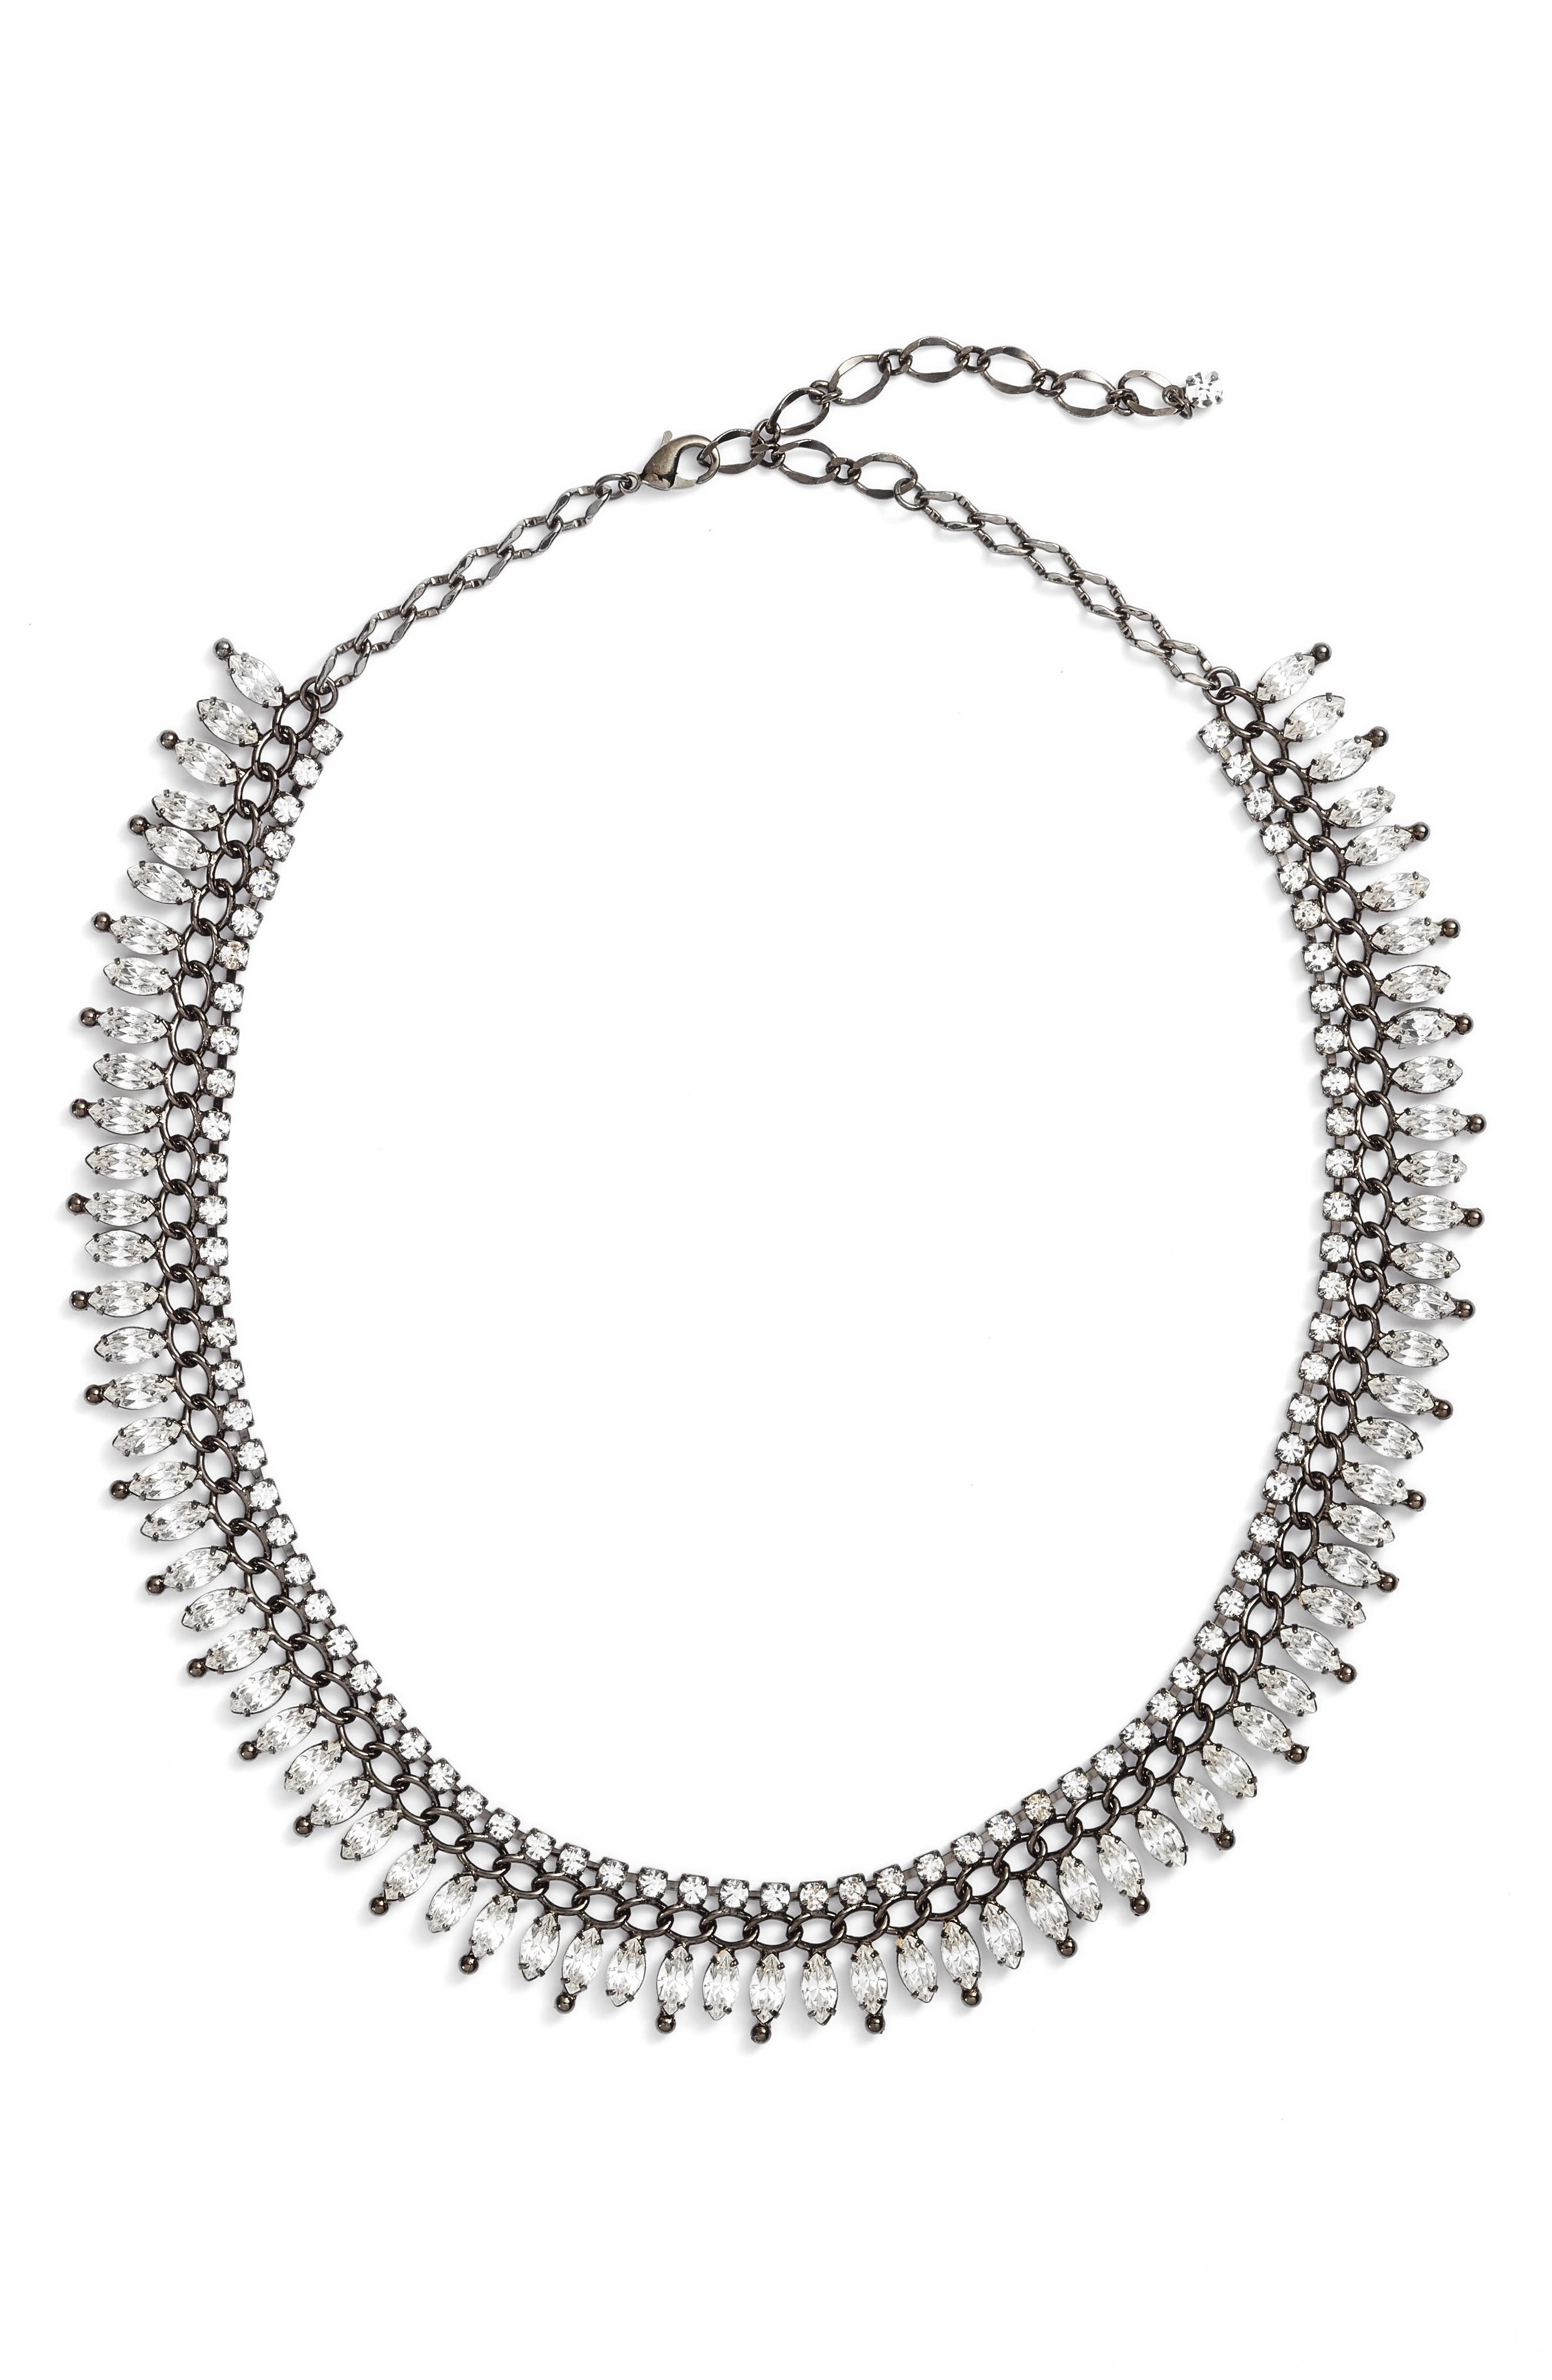 Main Image - CRISTABELLE Multi Navette Necklace